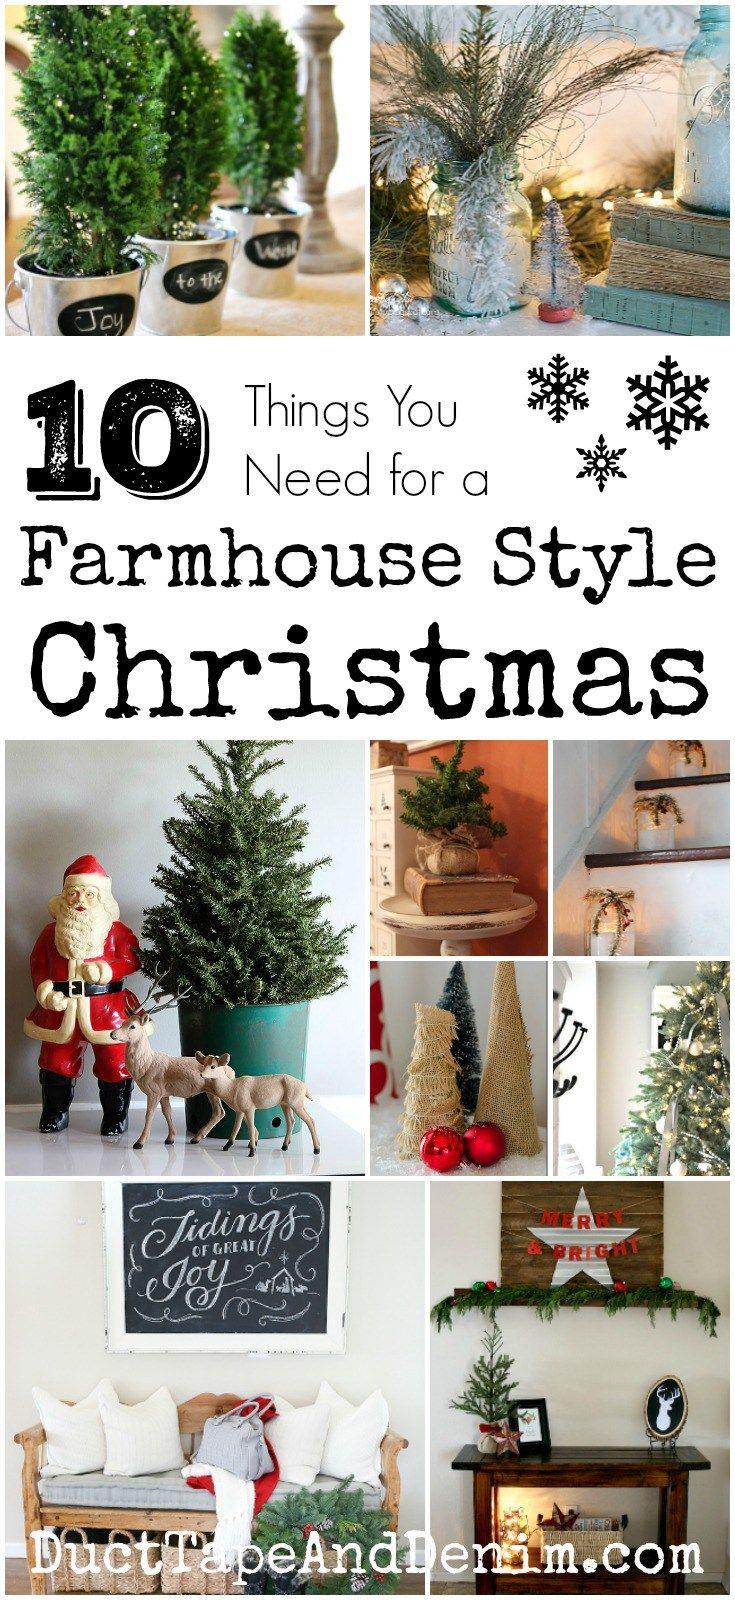 Farmhouse Decor ☆ Hometalk Diy Christmas☆ Christmas